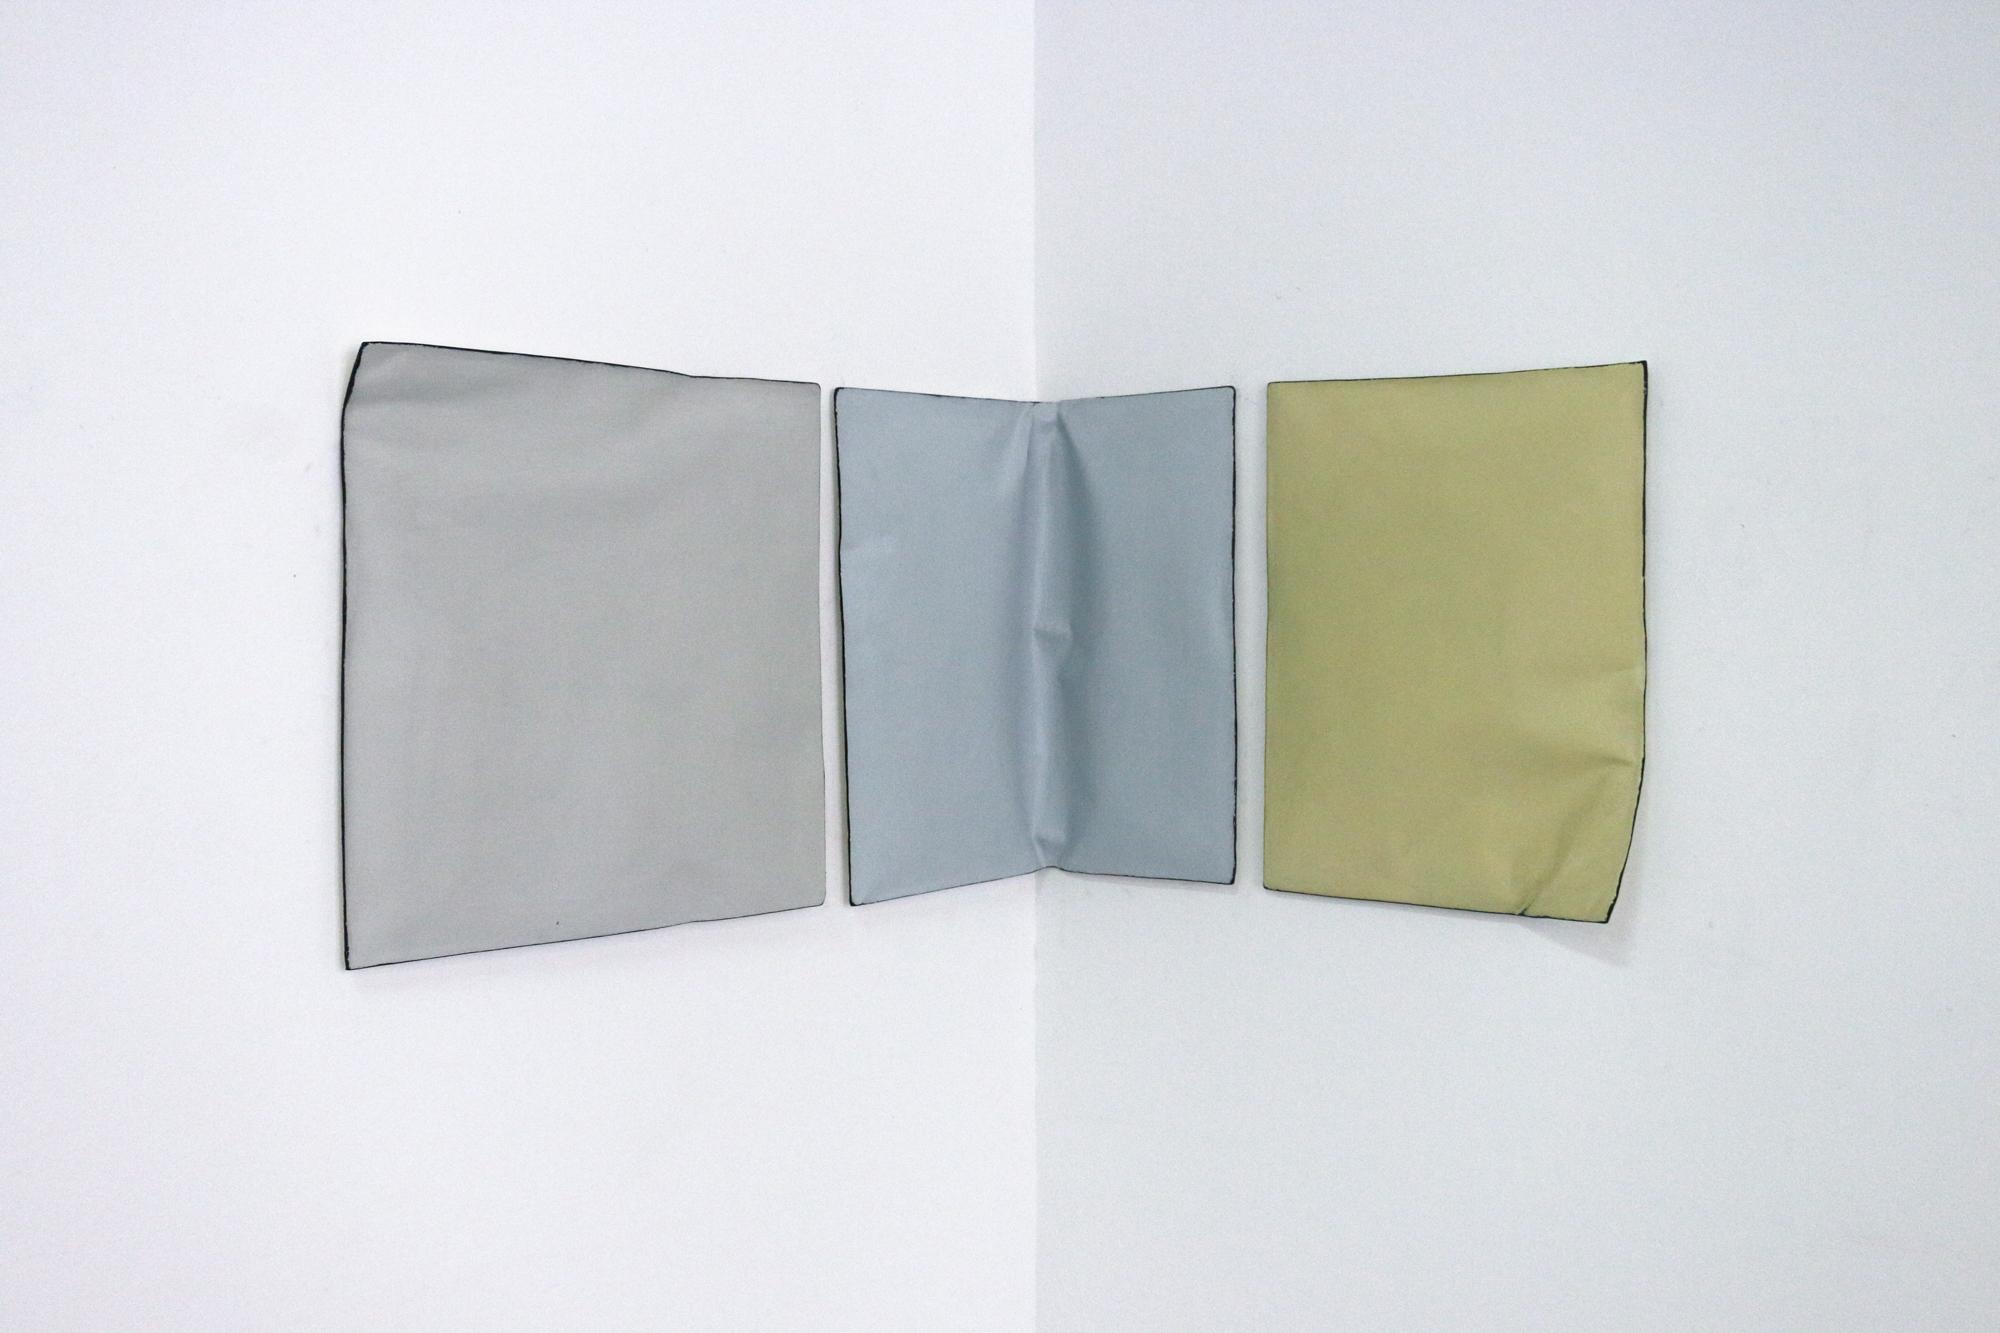 Johan De Wit, Untitled, 2018, Paper, Resin, Marble, Acrylic, 128 x 42 x 5 cm, Affinity Art